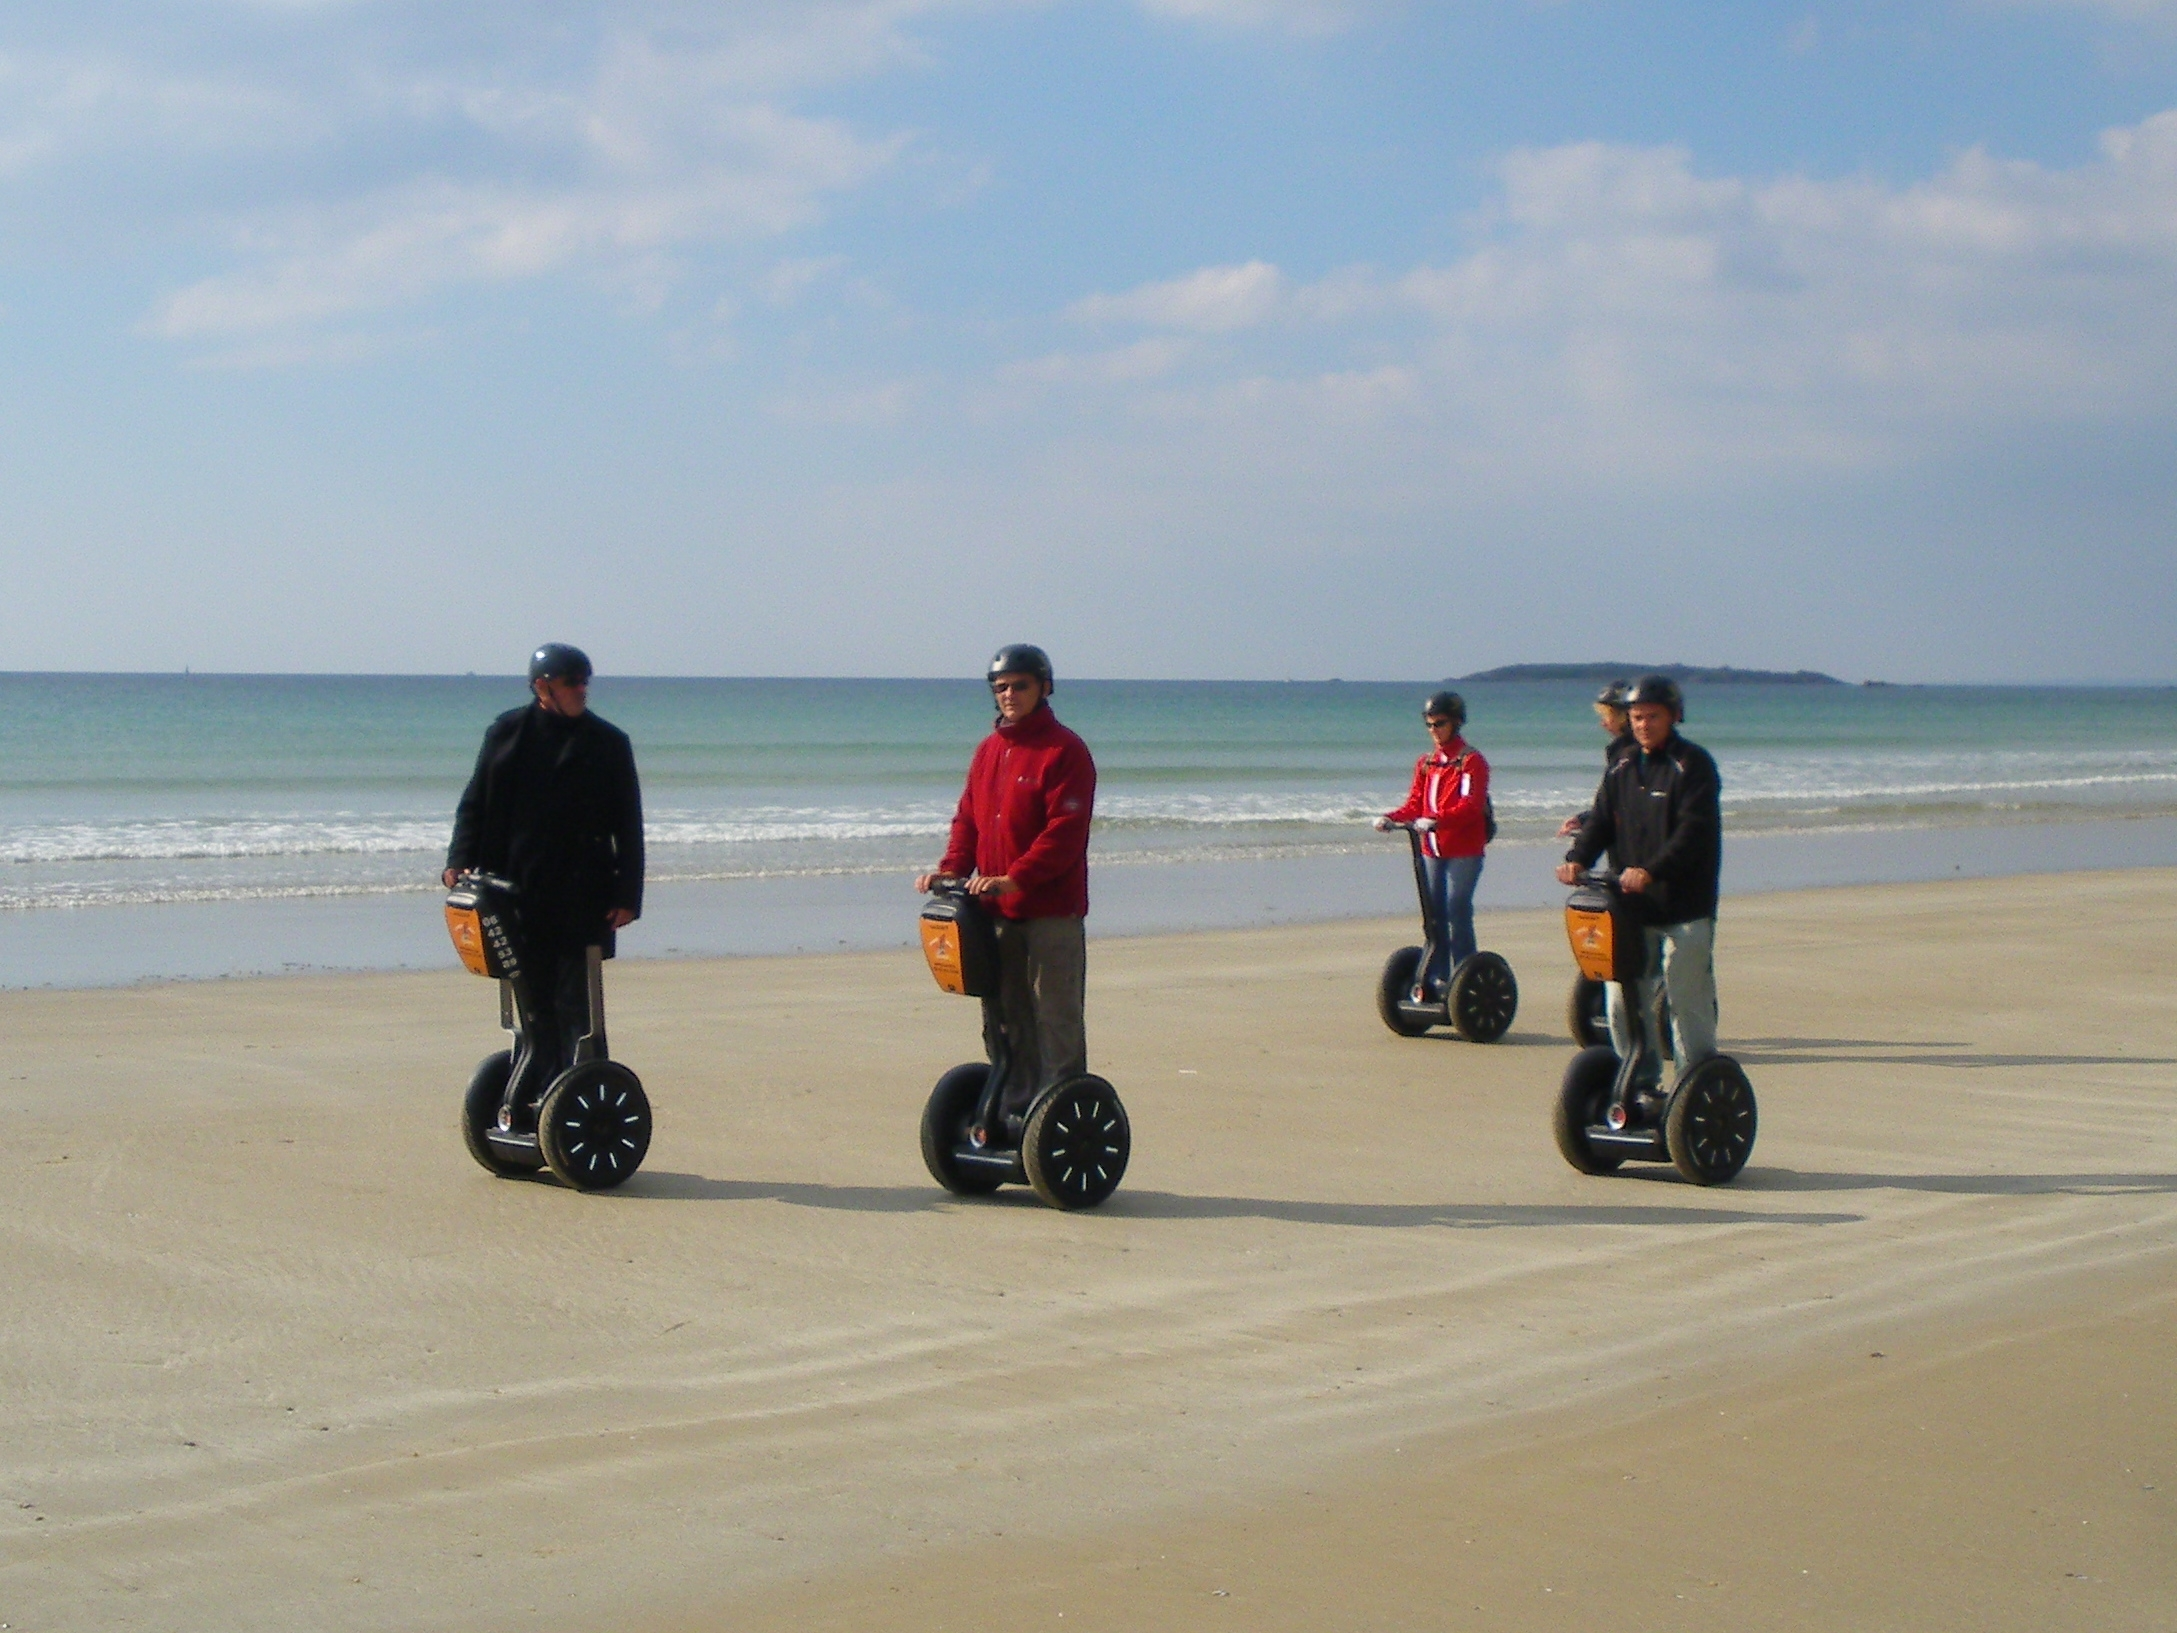 Balade en gyropode Morbihan ; loisirs Bretagne ; Groix